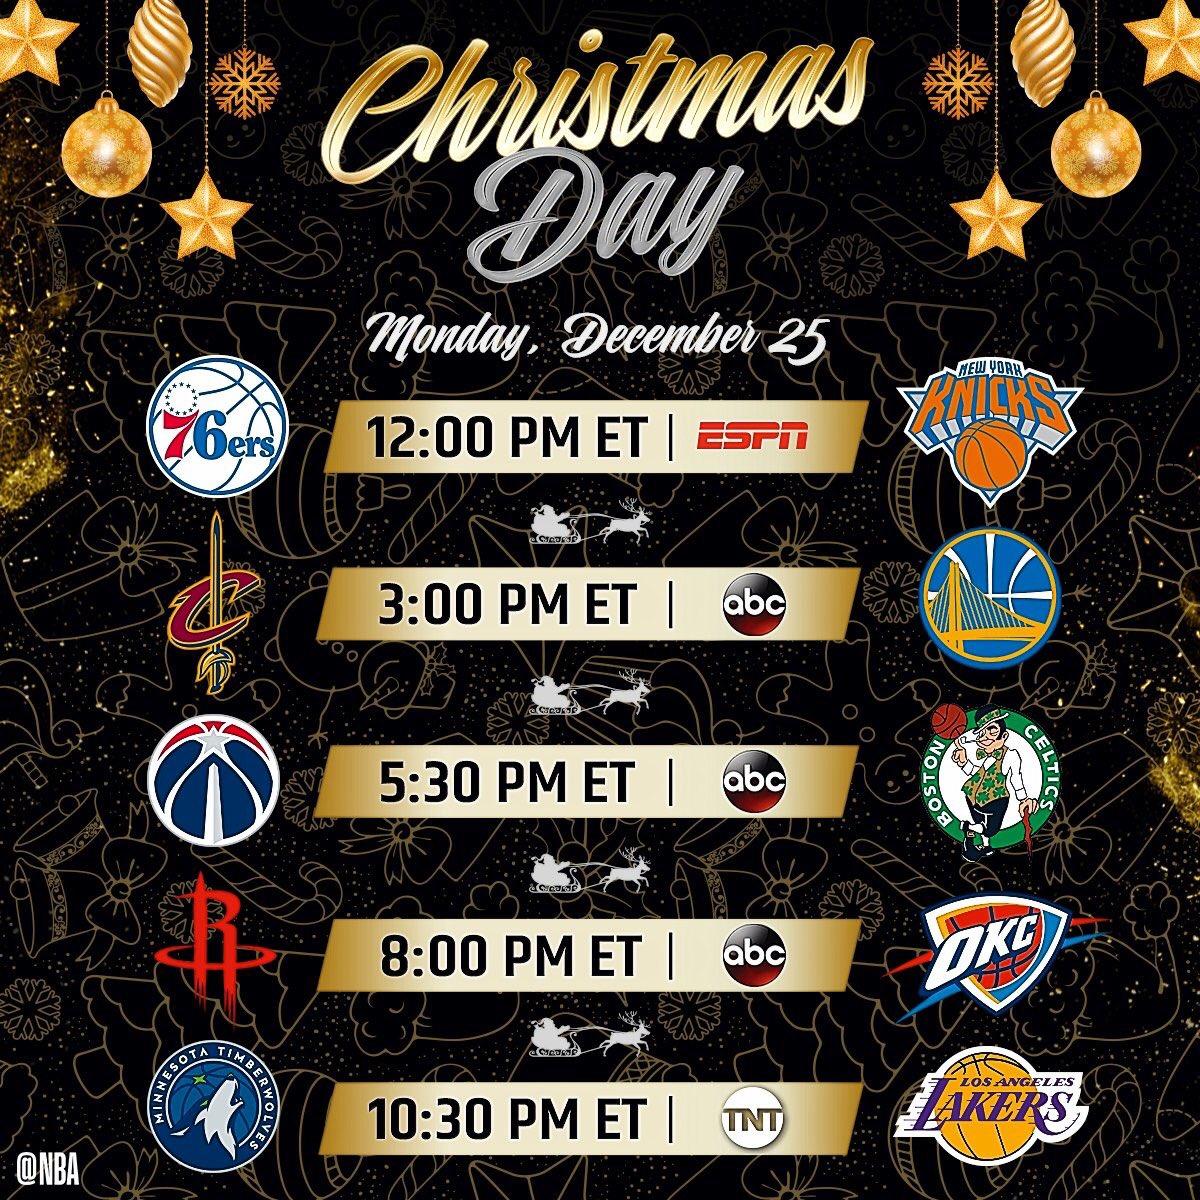 Nba Christmas Schedule.2017 Nba Christmas Game Schedule Lipstick Alley